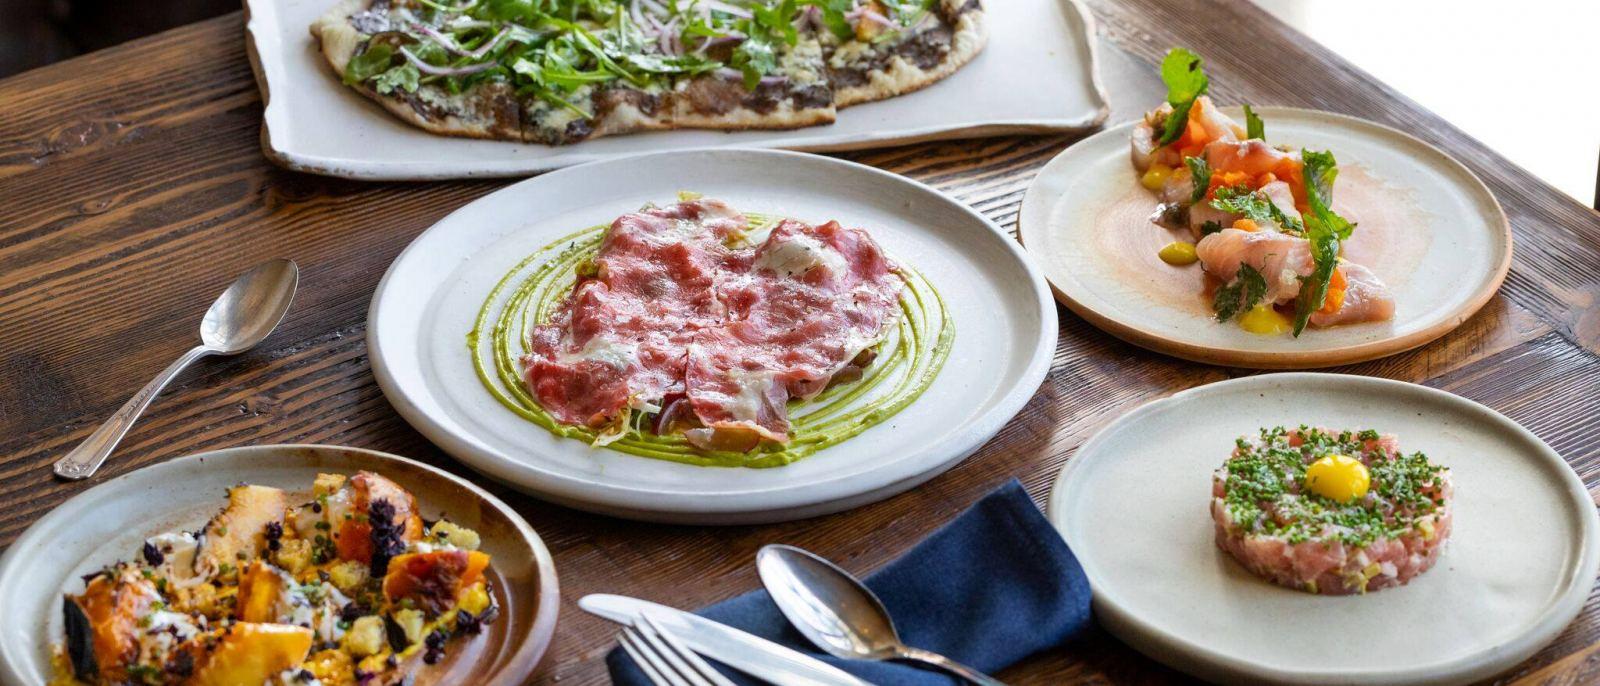 Tasting menu at Scratch | Bar & Kitchen